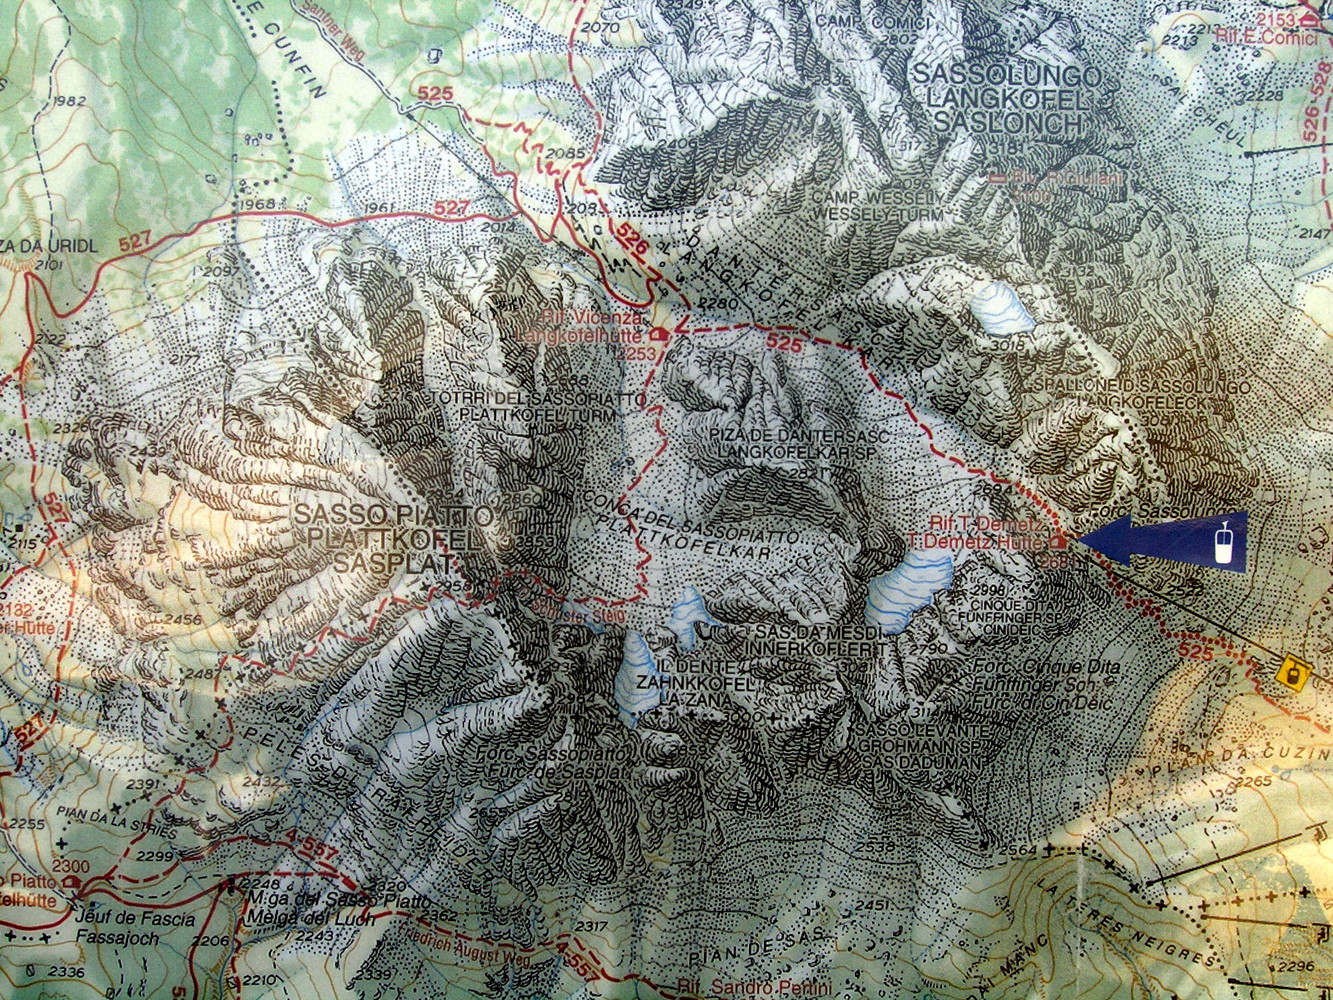 Carte du groupe du Sassolungo